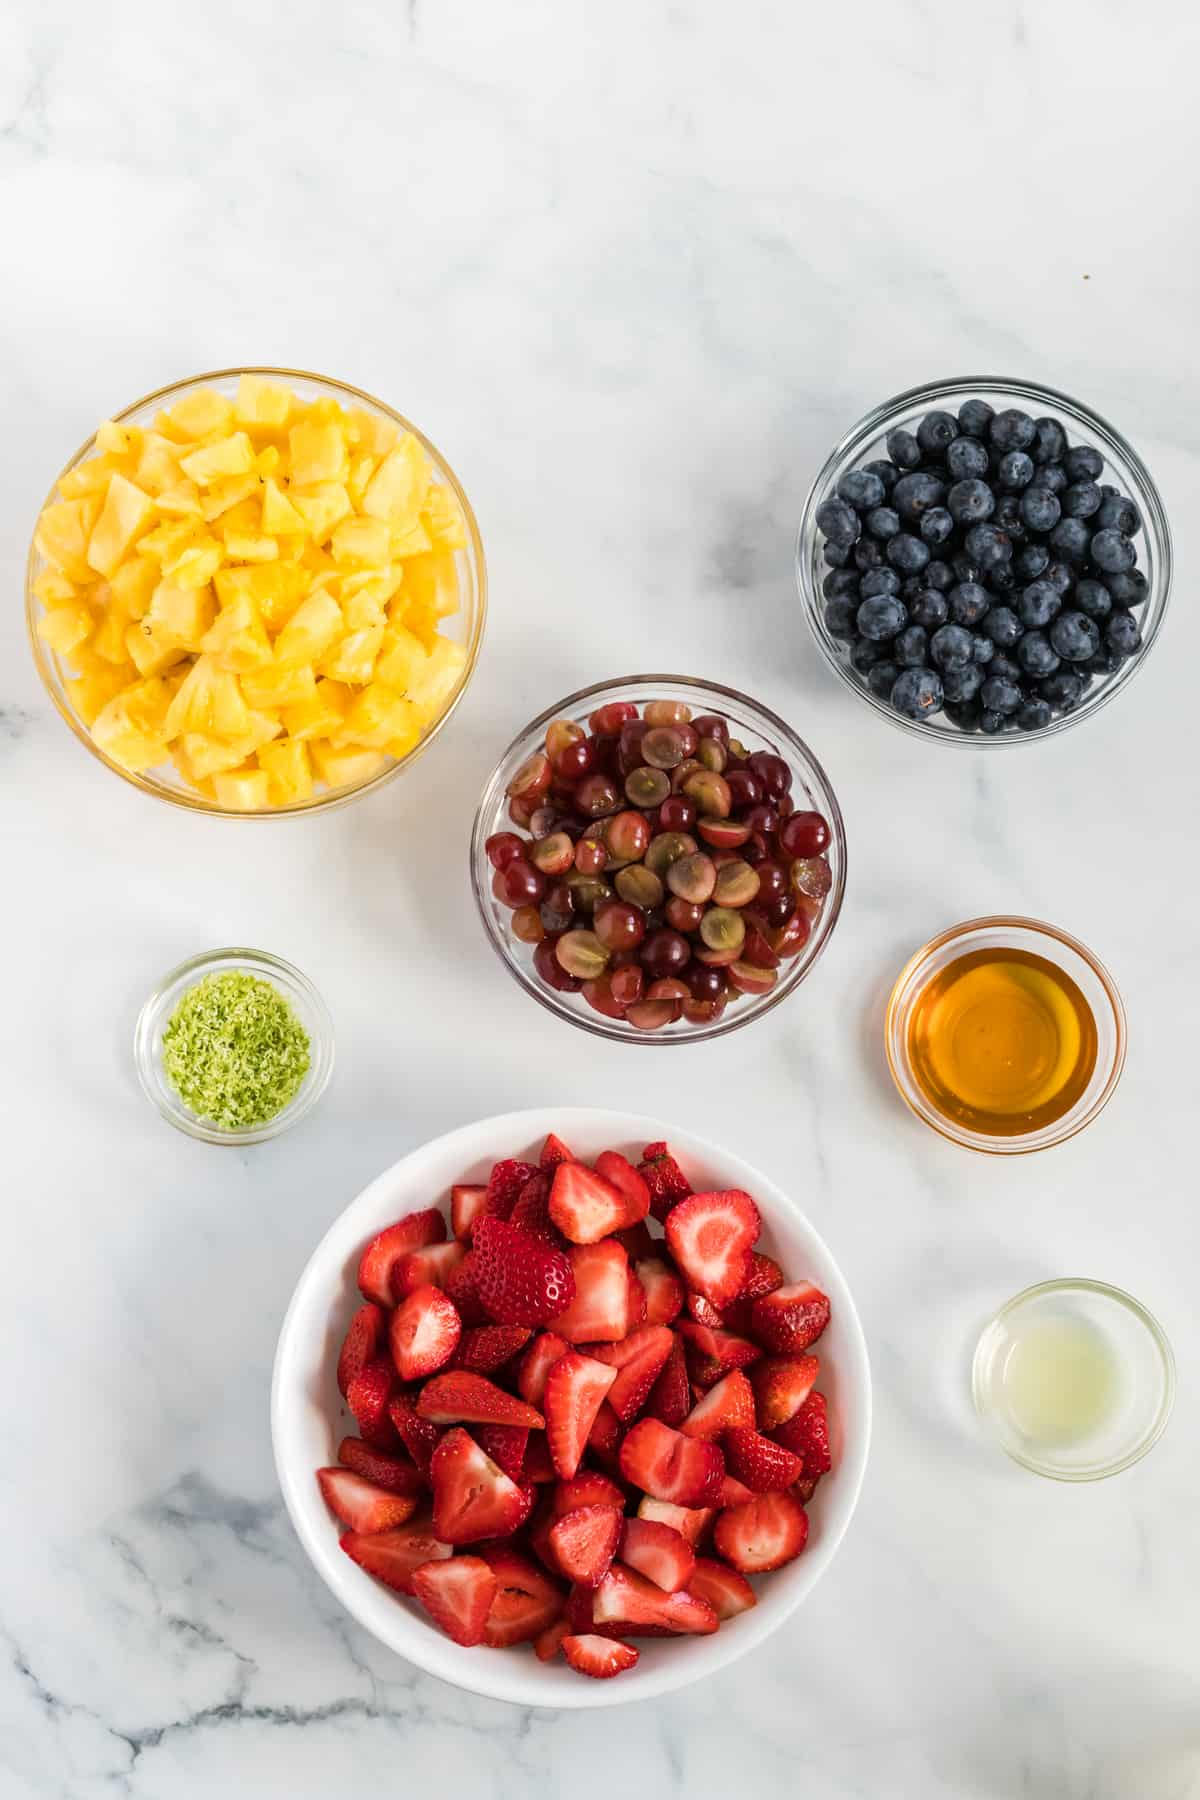 fruit salad ingredients in separate glass bowls